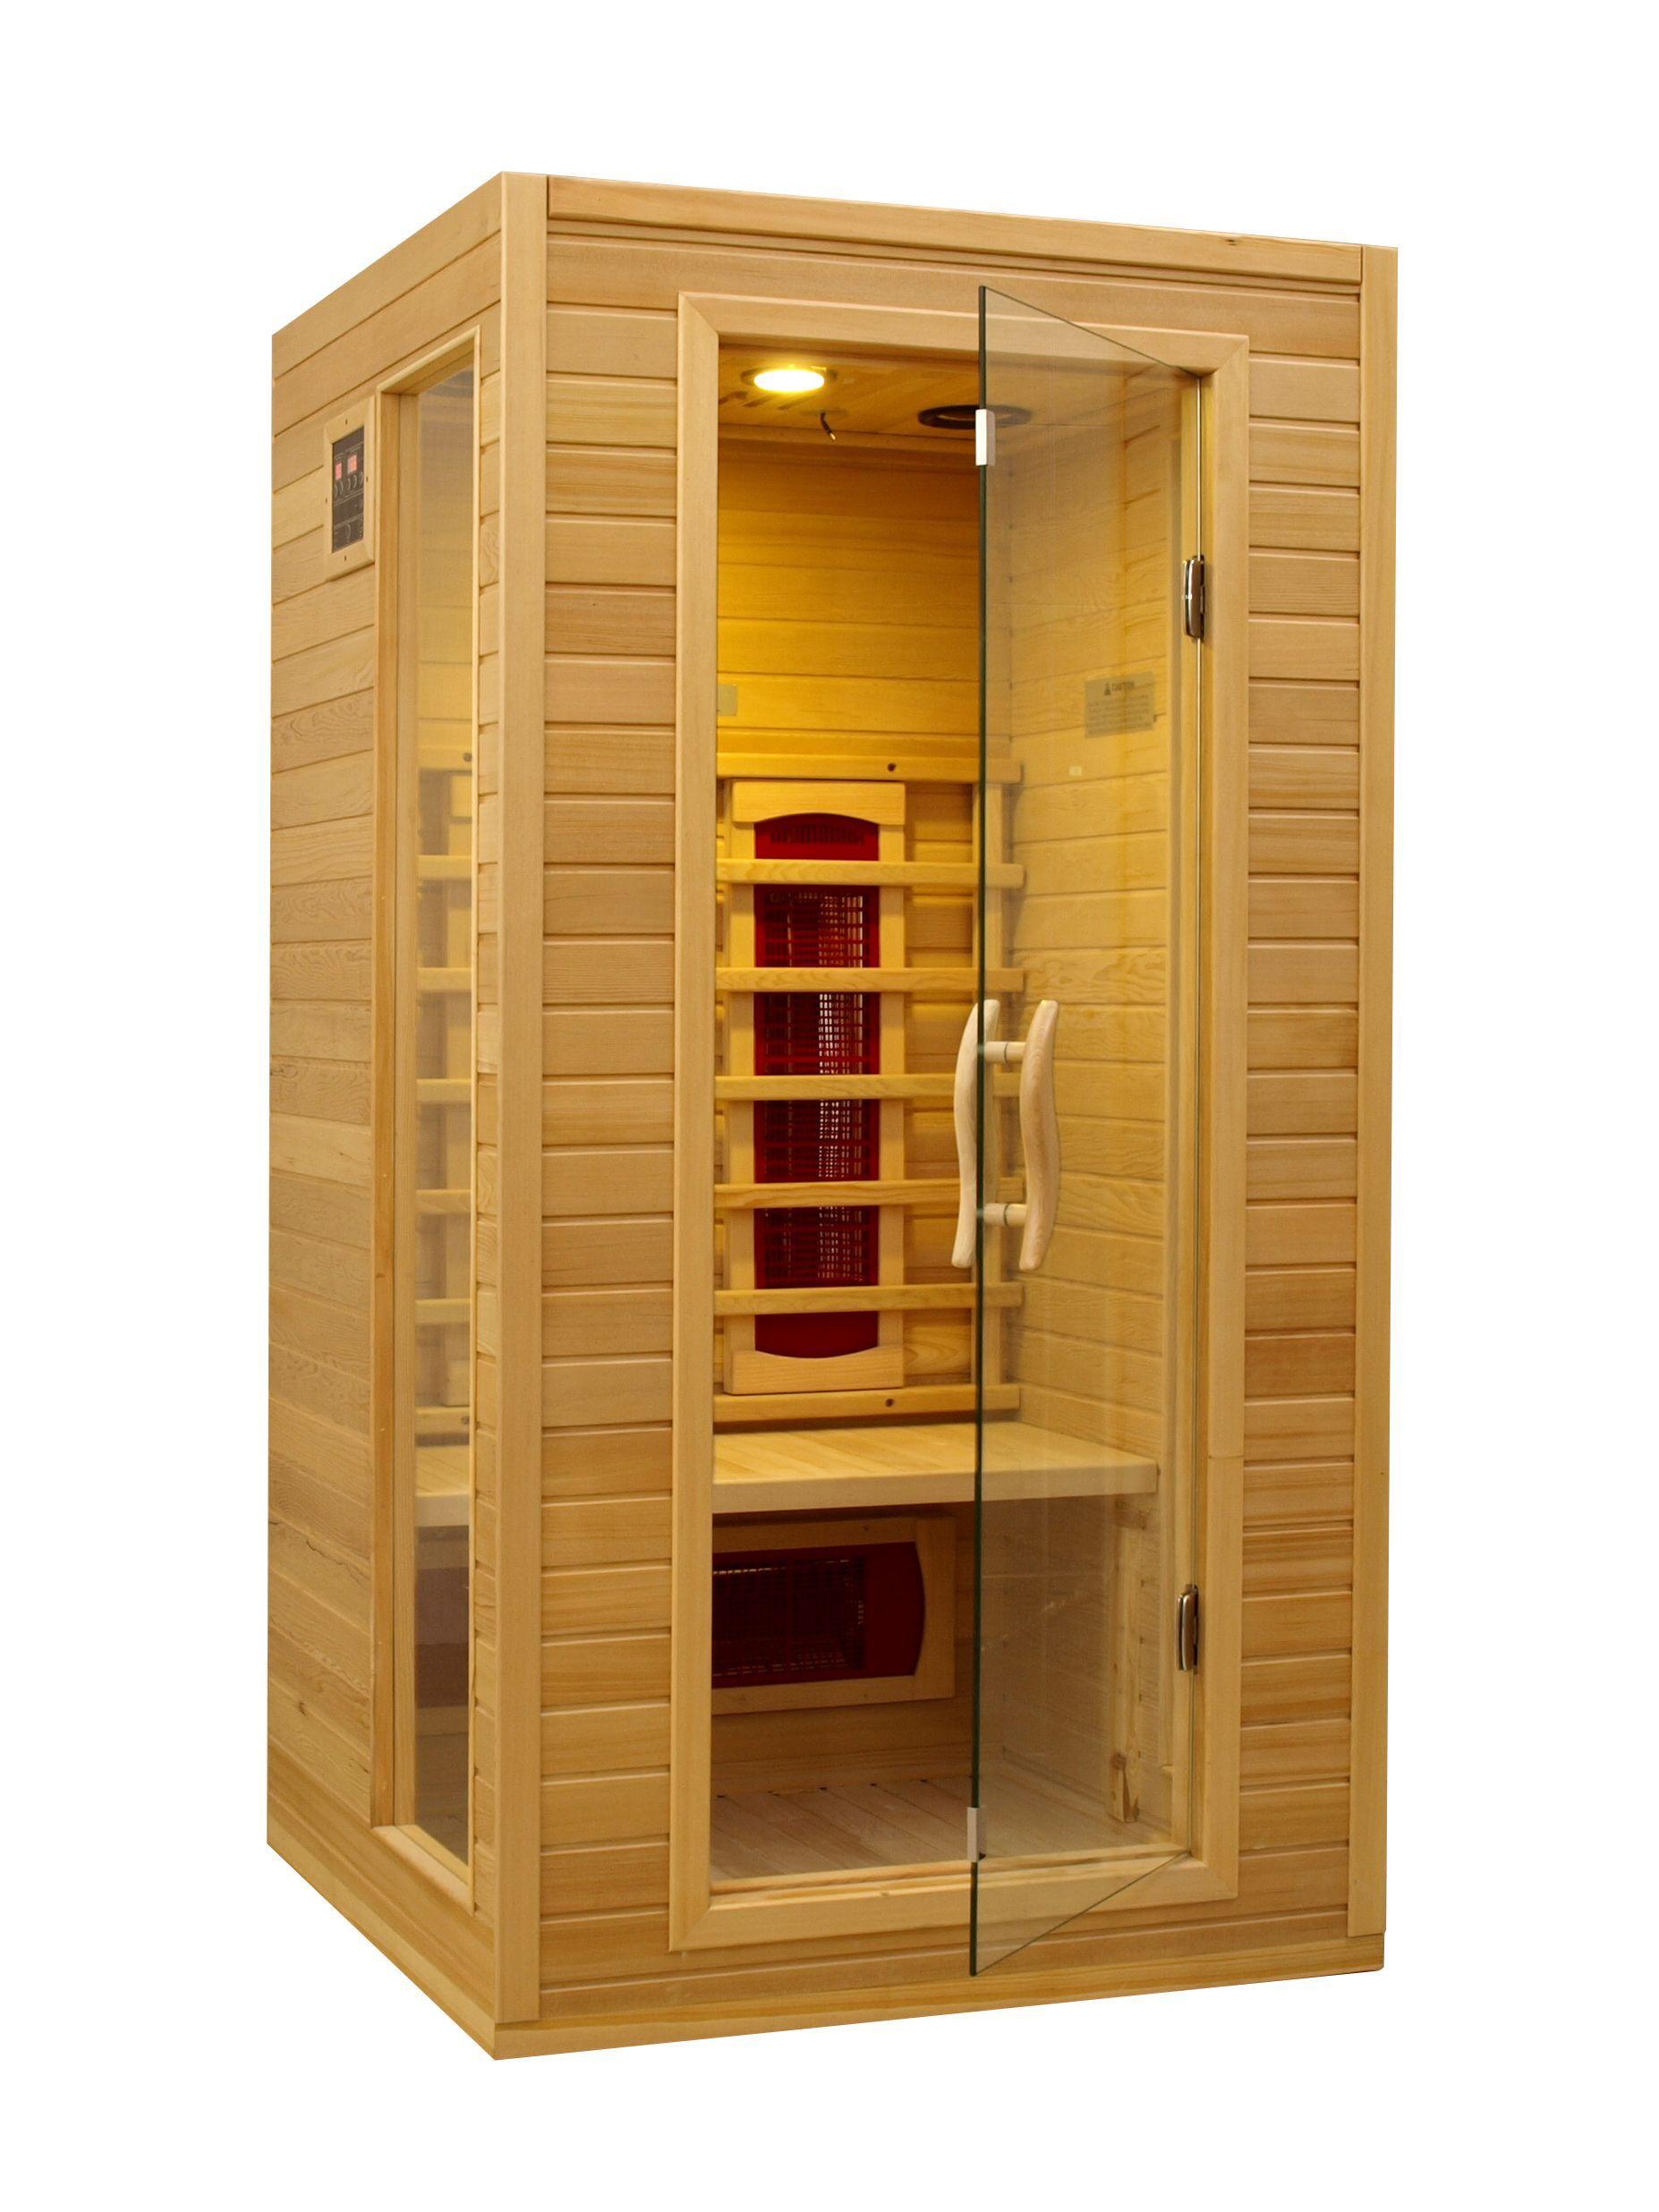 2 person ceramic far infrared sauna i hot tubs saunas